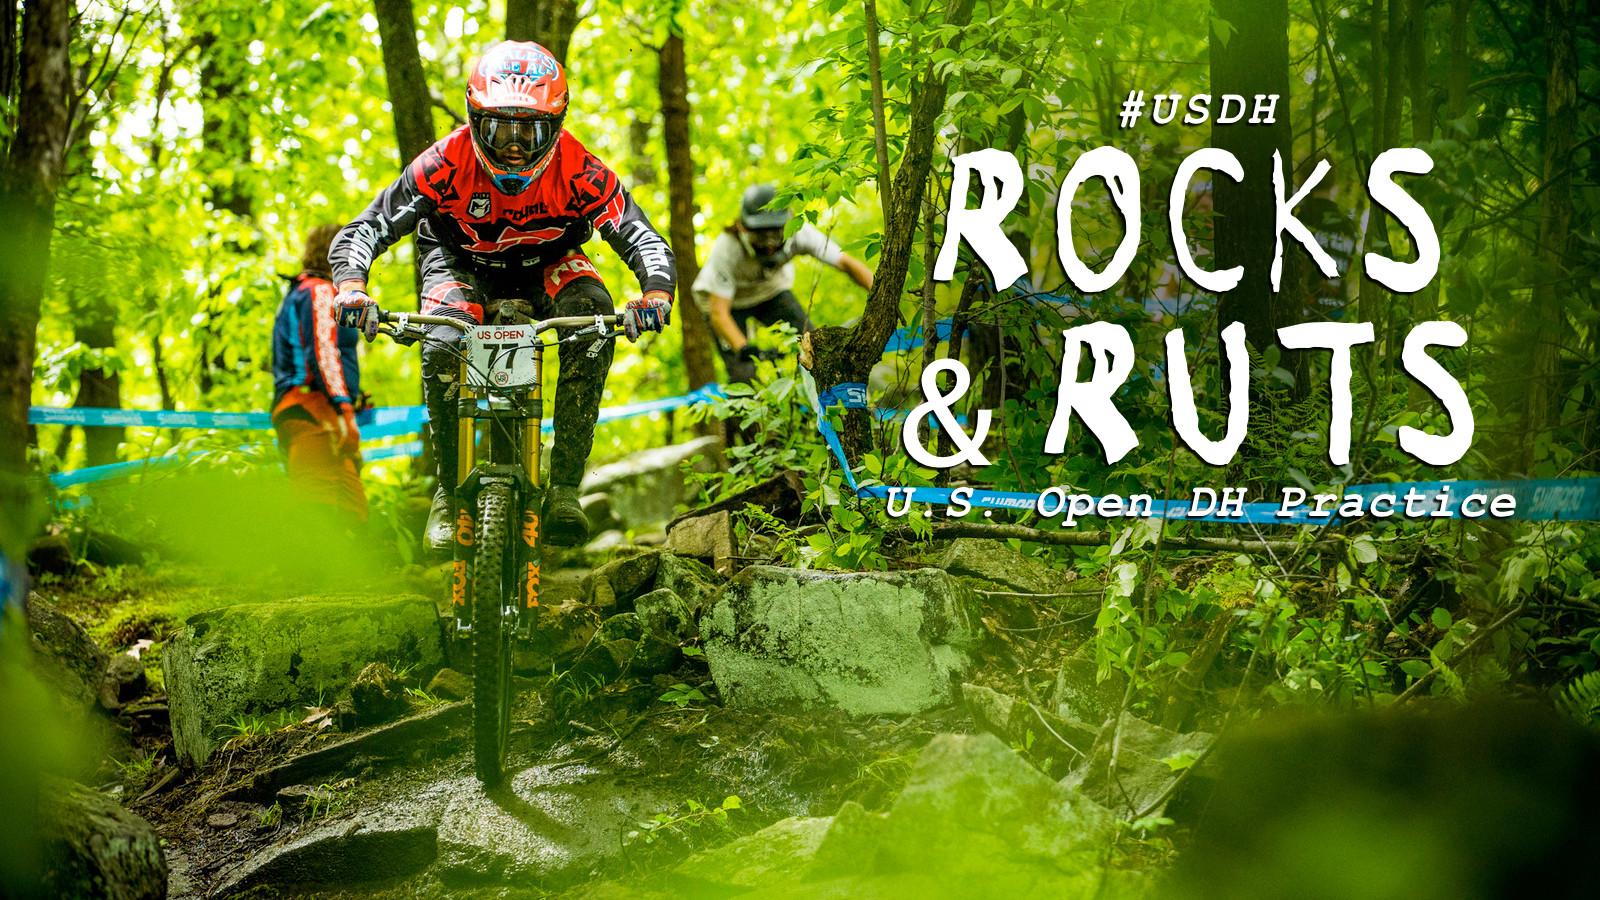 East Coast Rocks and Ruts - U.S. Open DH Practice